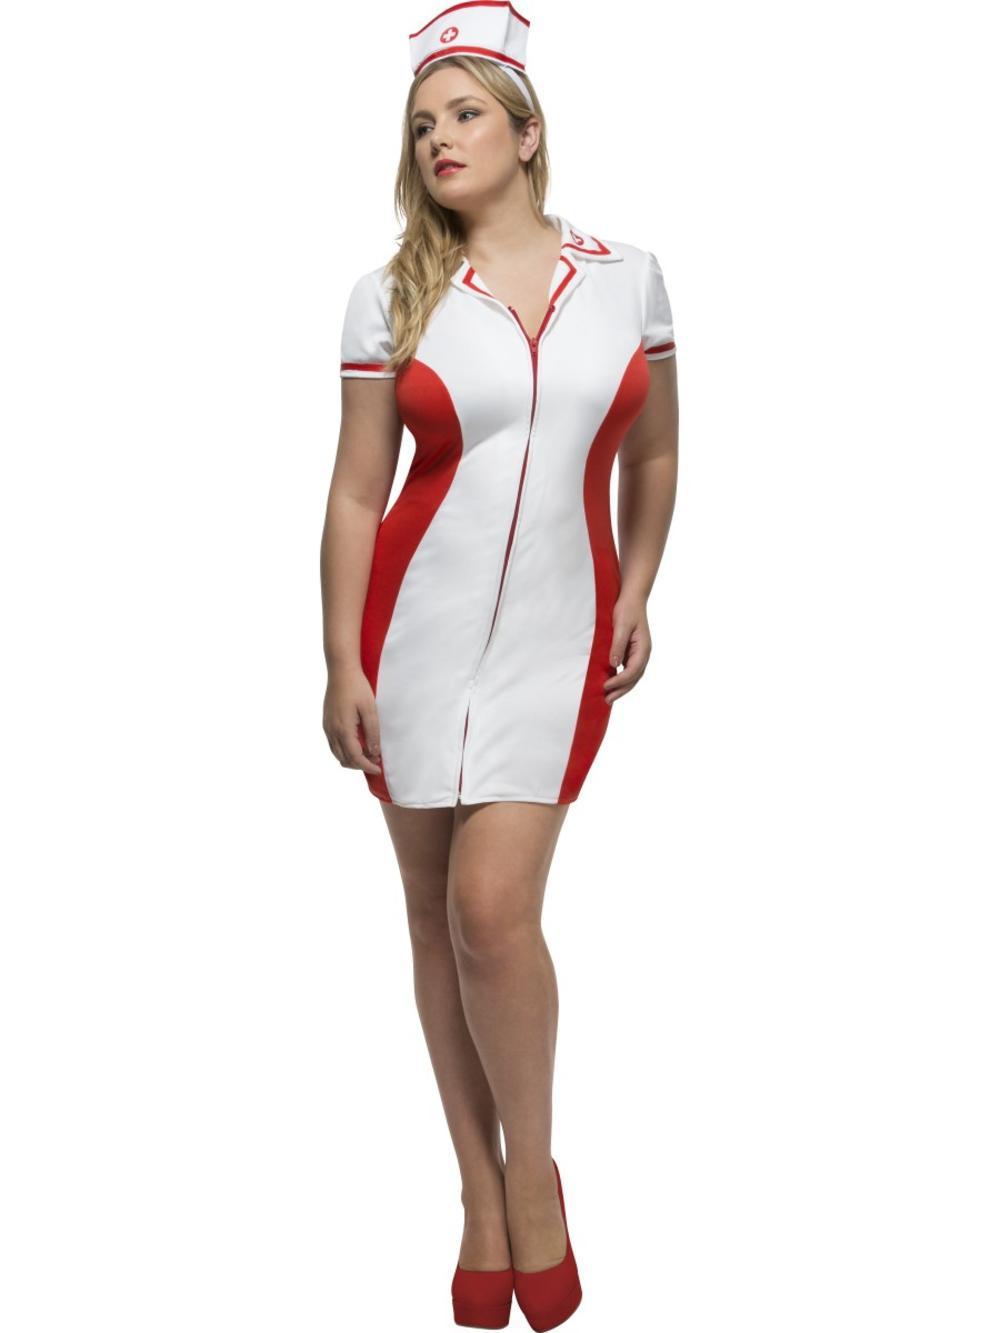 Fever Curves Nurse Costume